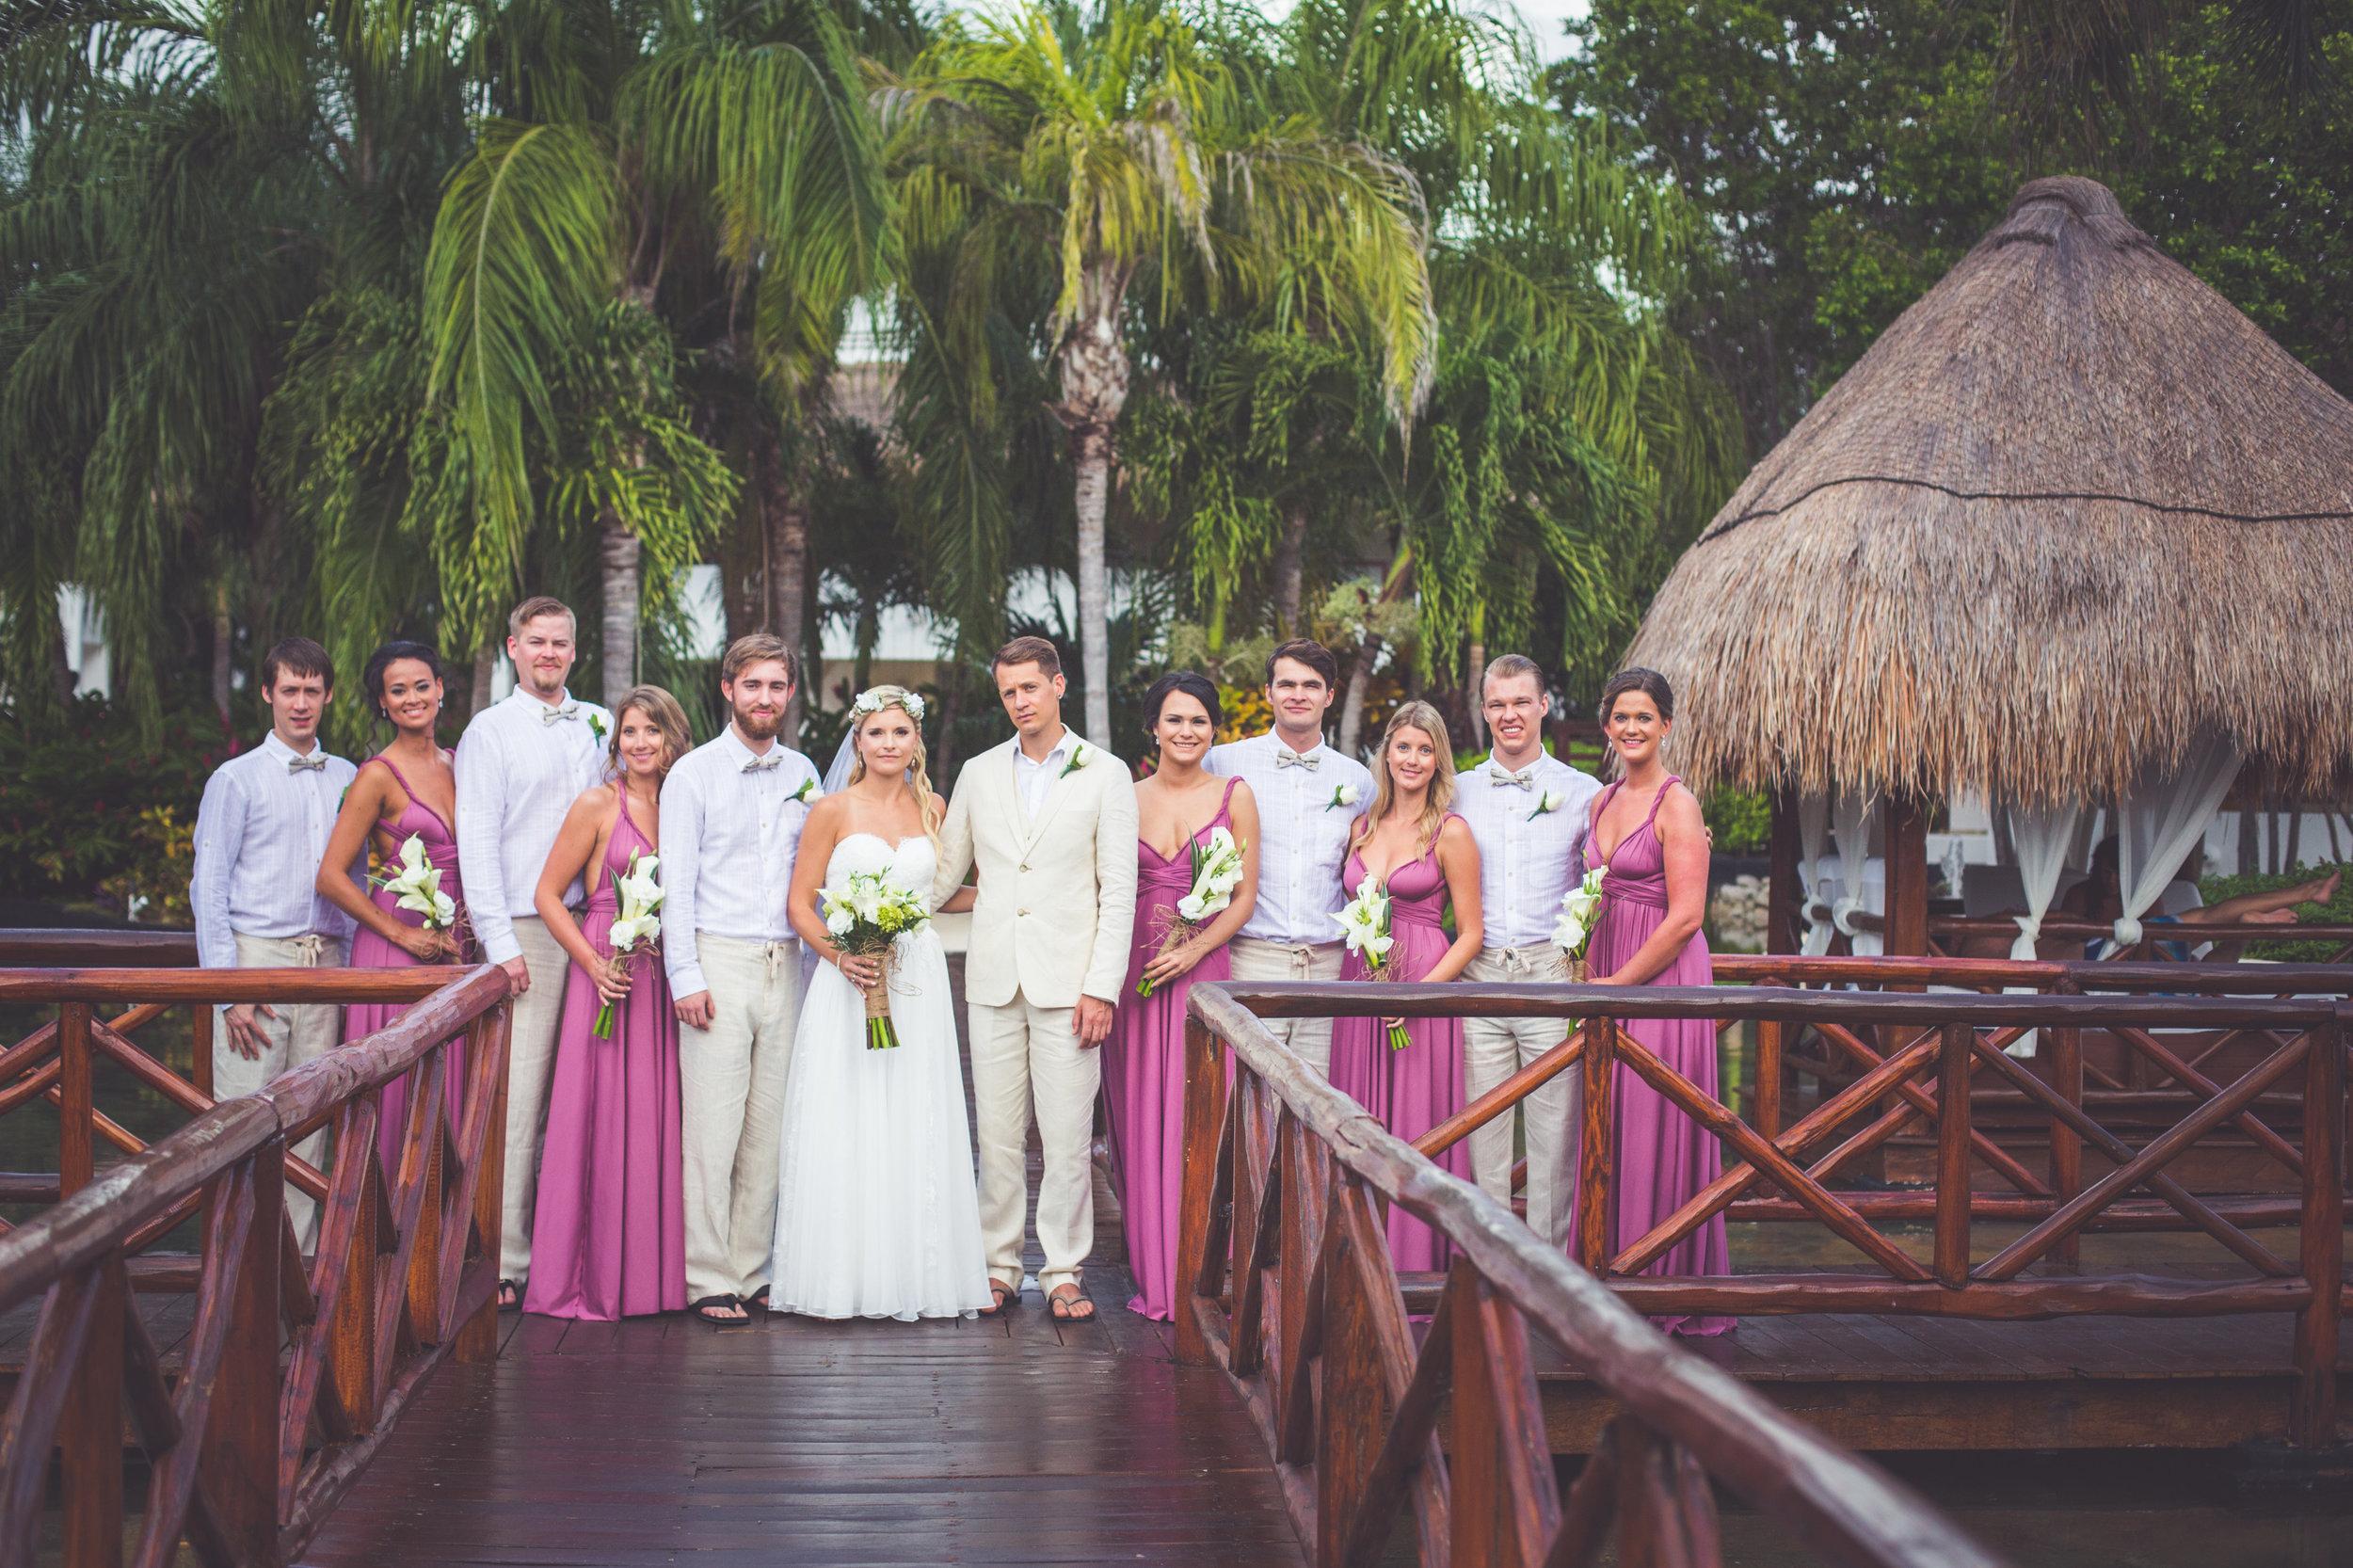 CARMEN-PETER-WEDDING-2016-72.jpg